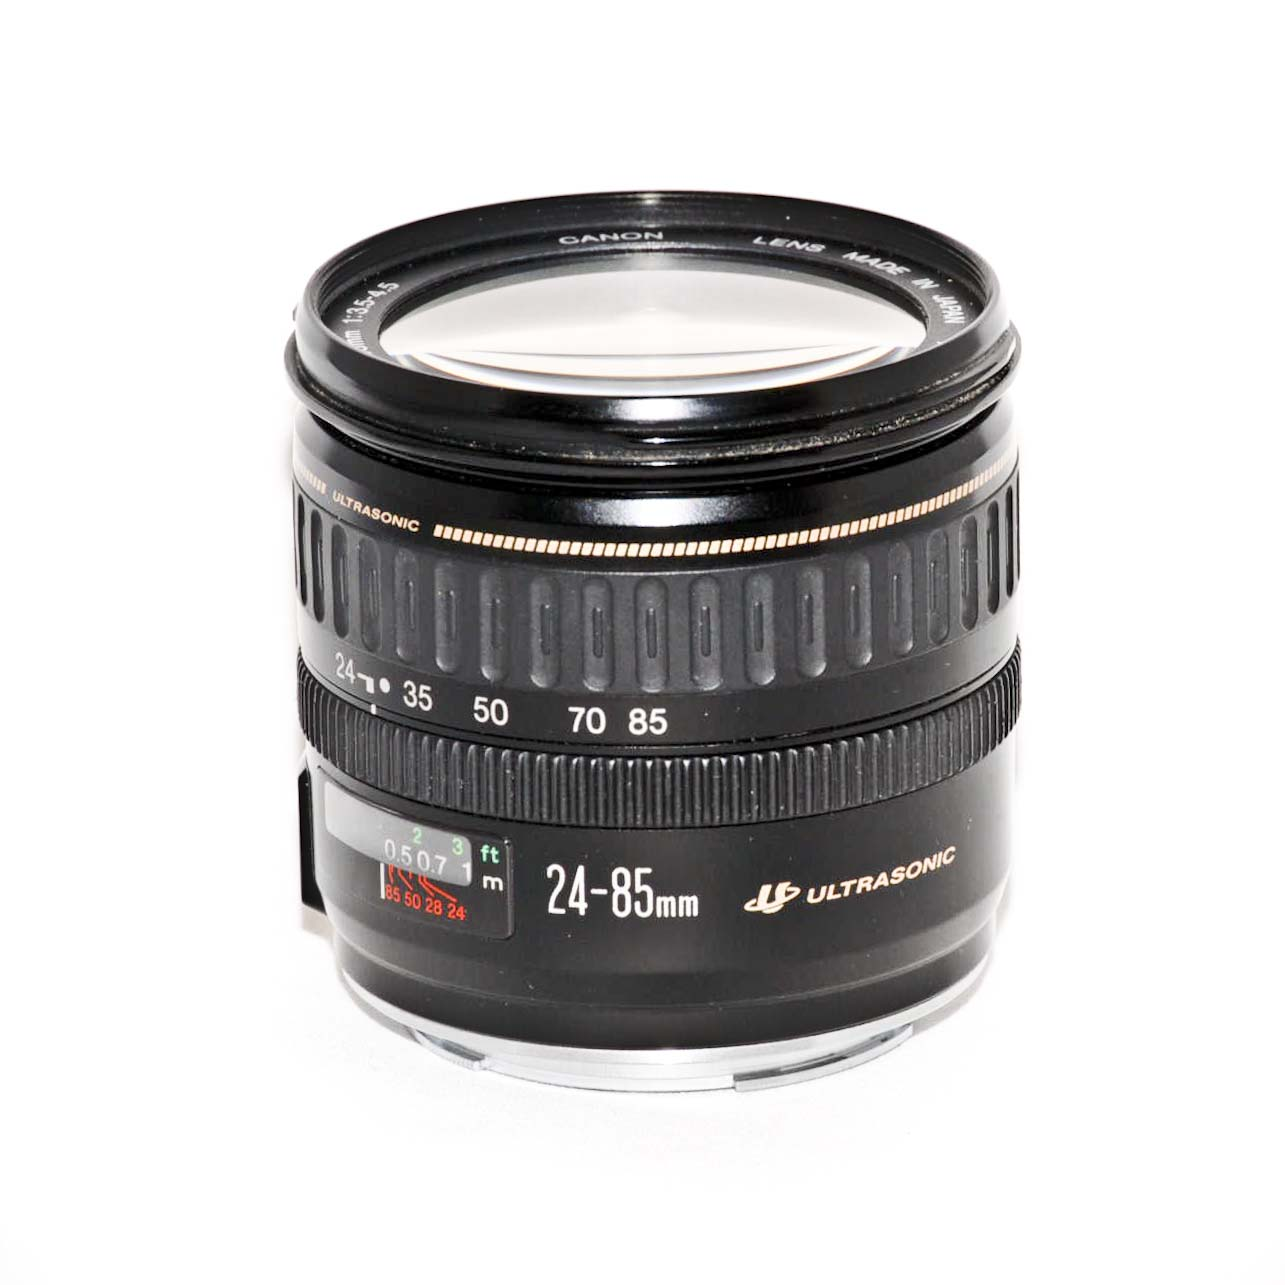 Canon EF 24-85mm f3.5-4.5 USM Lens 24-85/3.5-4.5 Silver   eBay